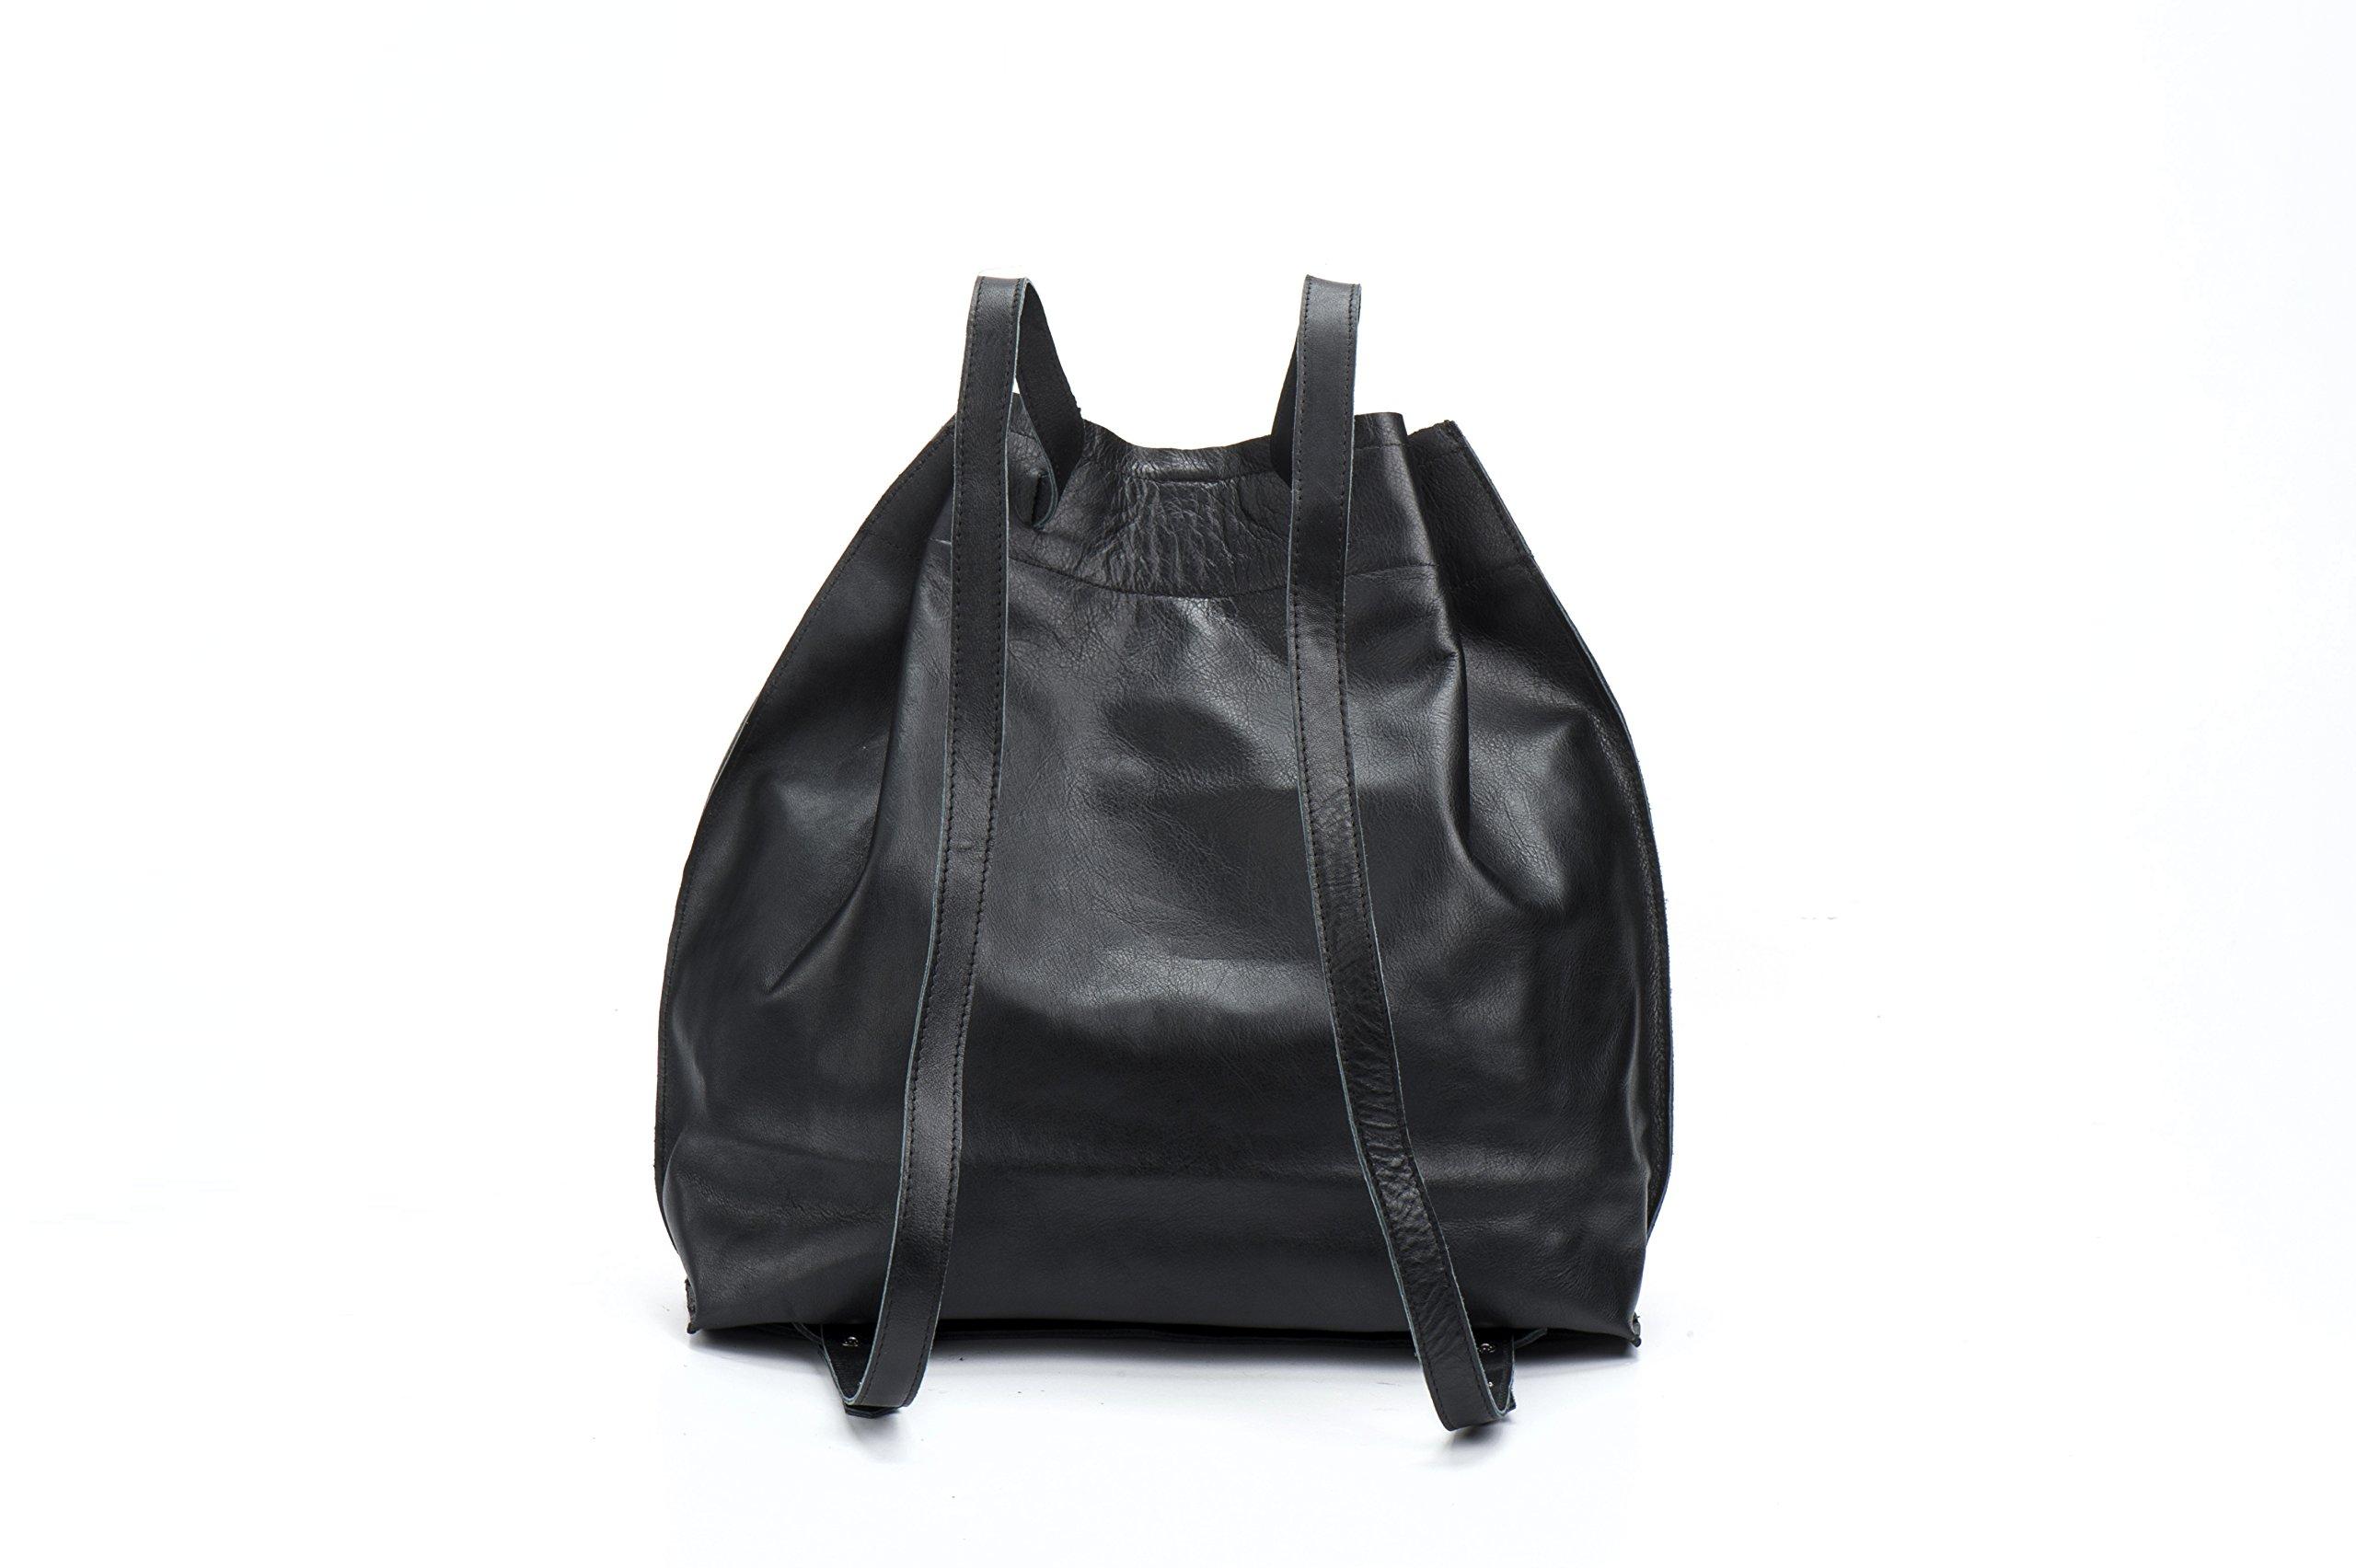 Handmade Artisan Casual Everyday Small Fashionable Genuine Black Leather DayPack Rucksack